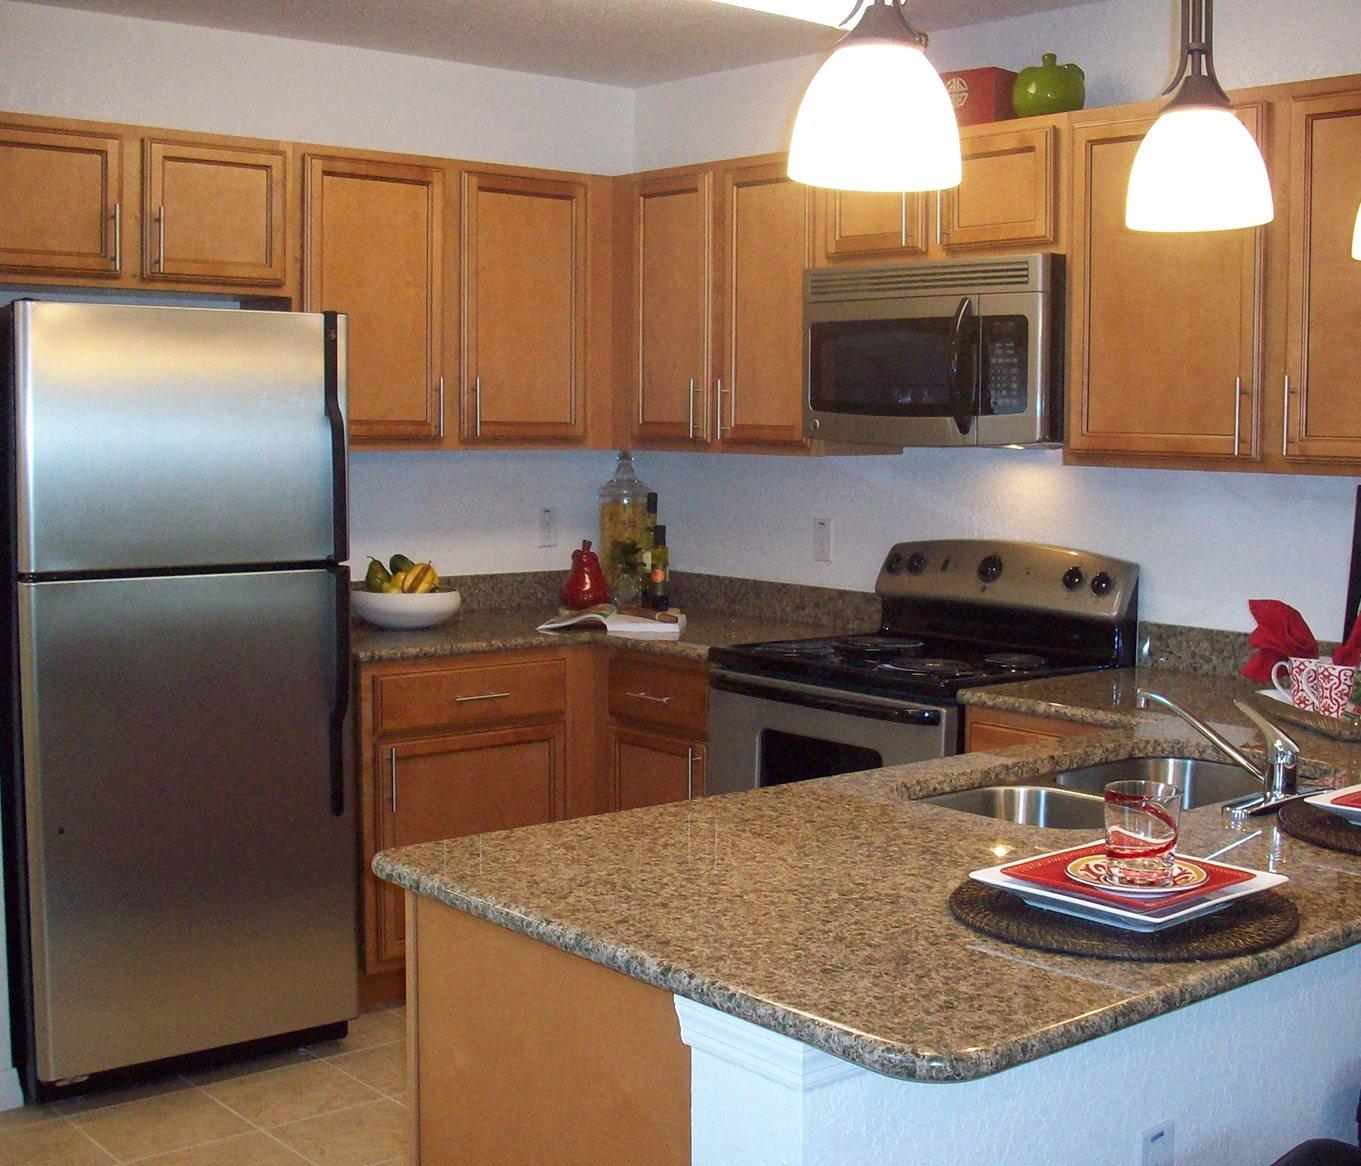 Rental Community In Kissimmee, FL